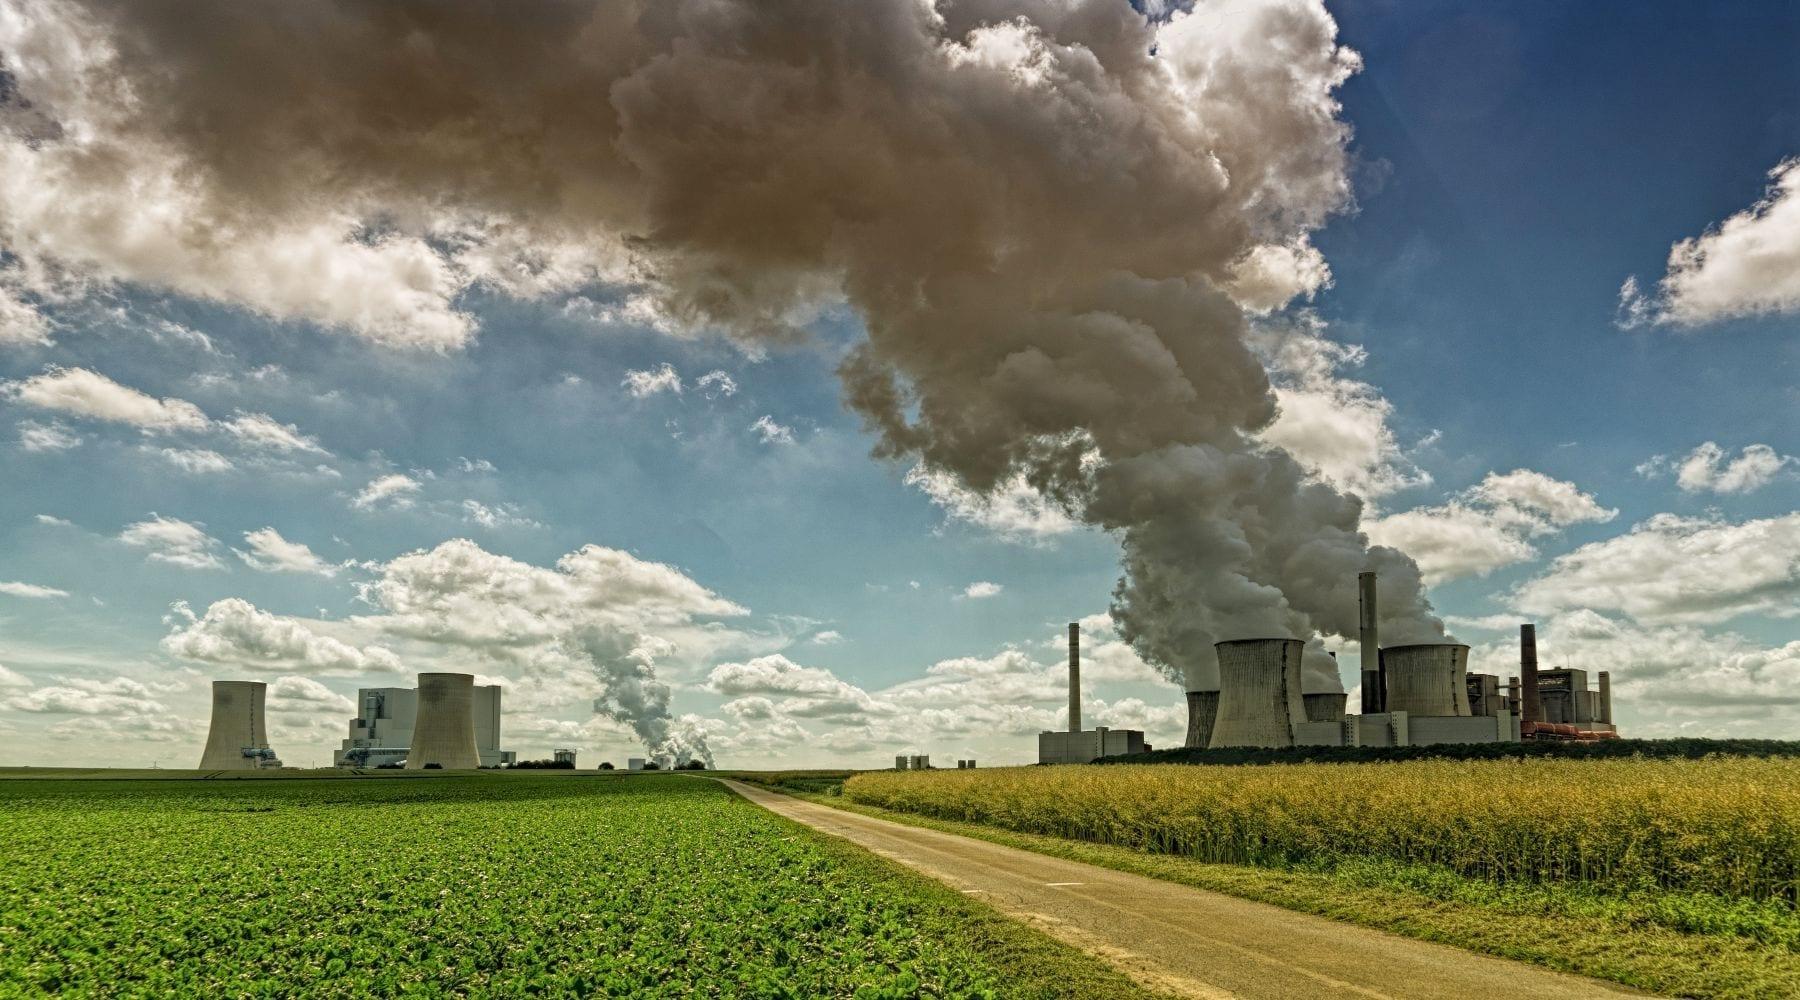 Cuts Weaken Effectiveness of State Environmental Agencies